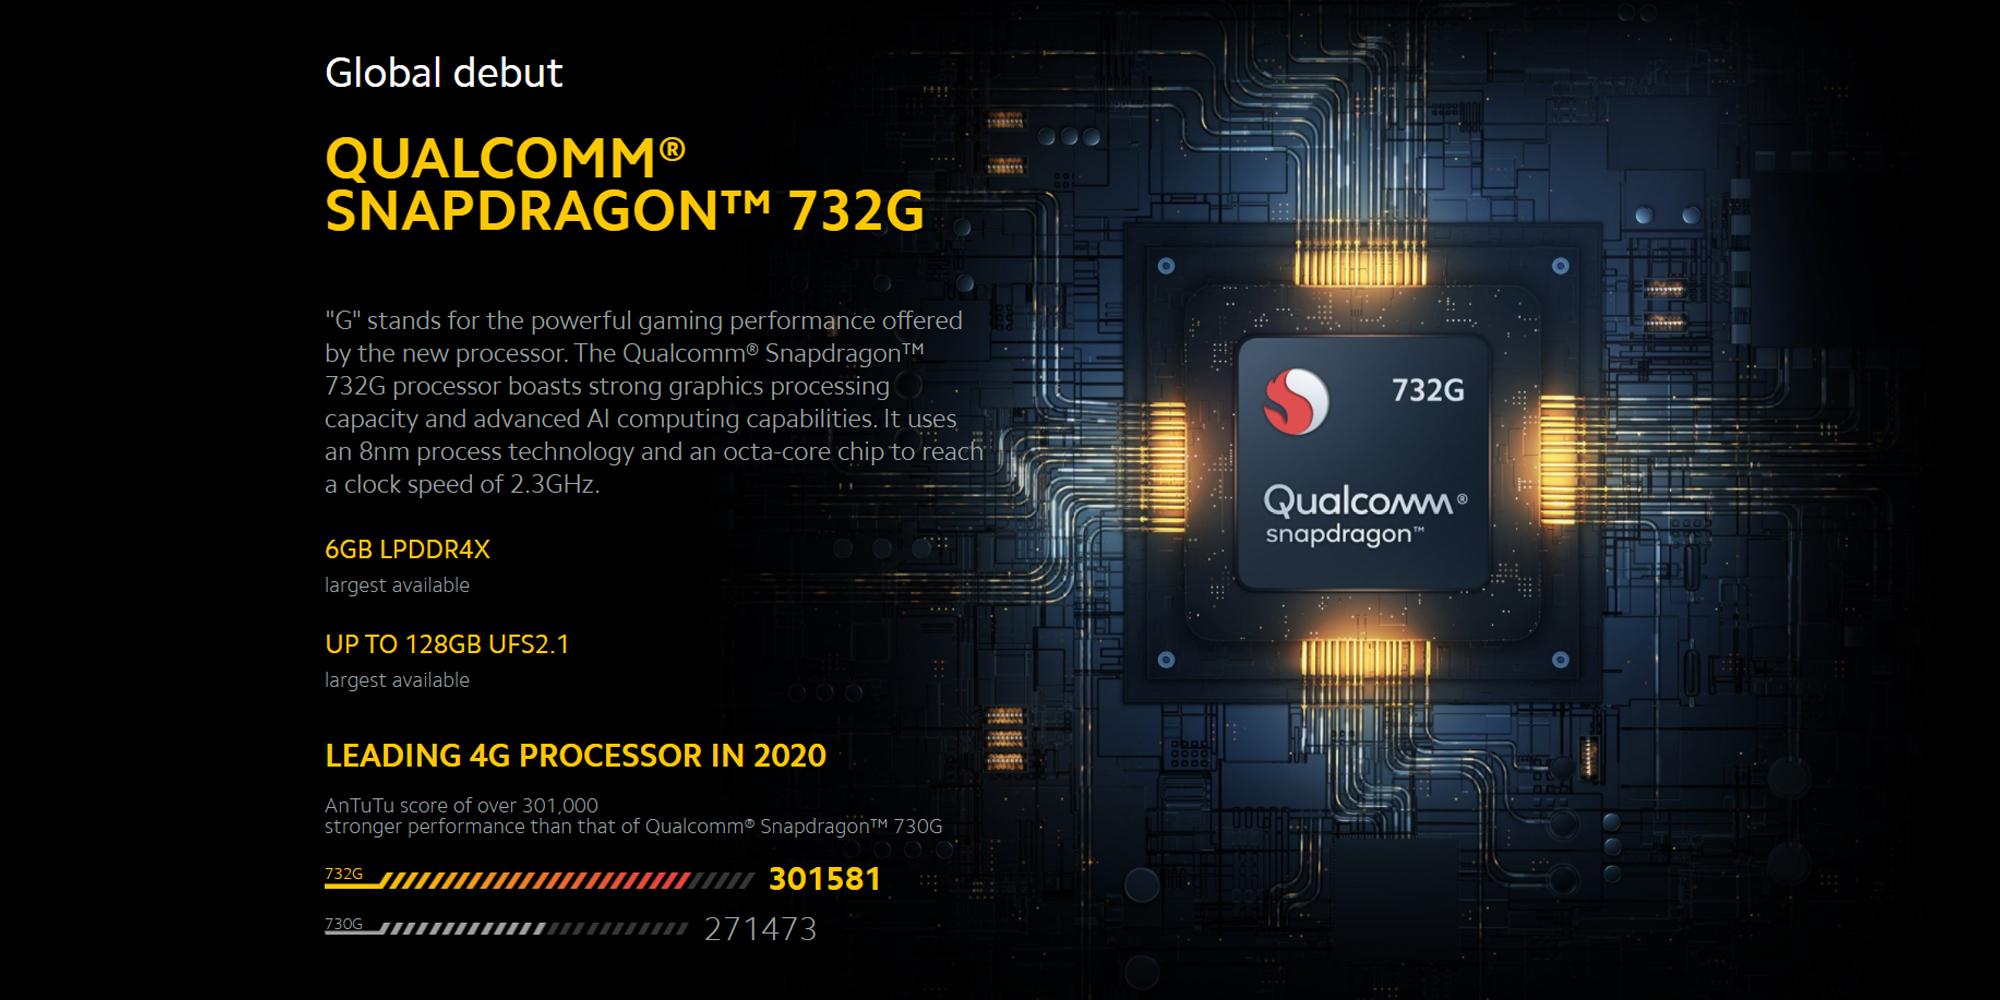 Xiaomi Poco X3 Dual SIM 6GB RAM 128GB 4G LTE Cobalt Blue-2